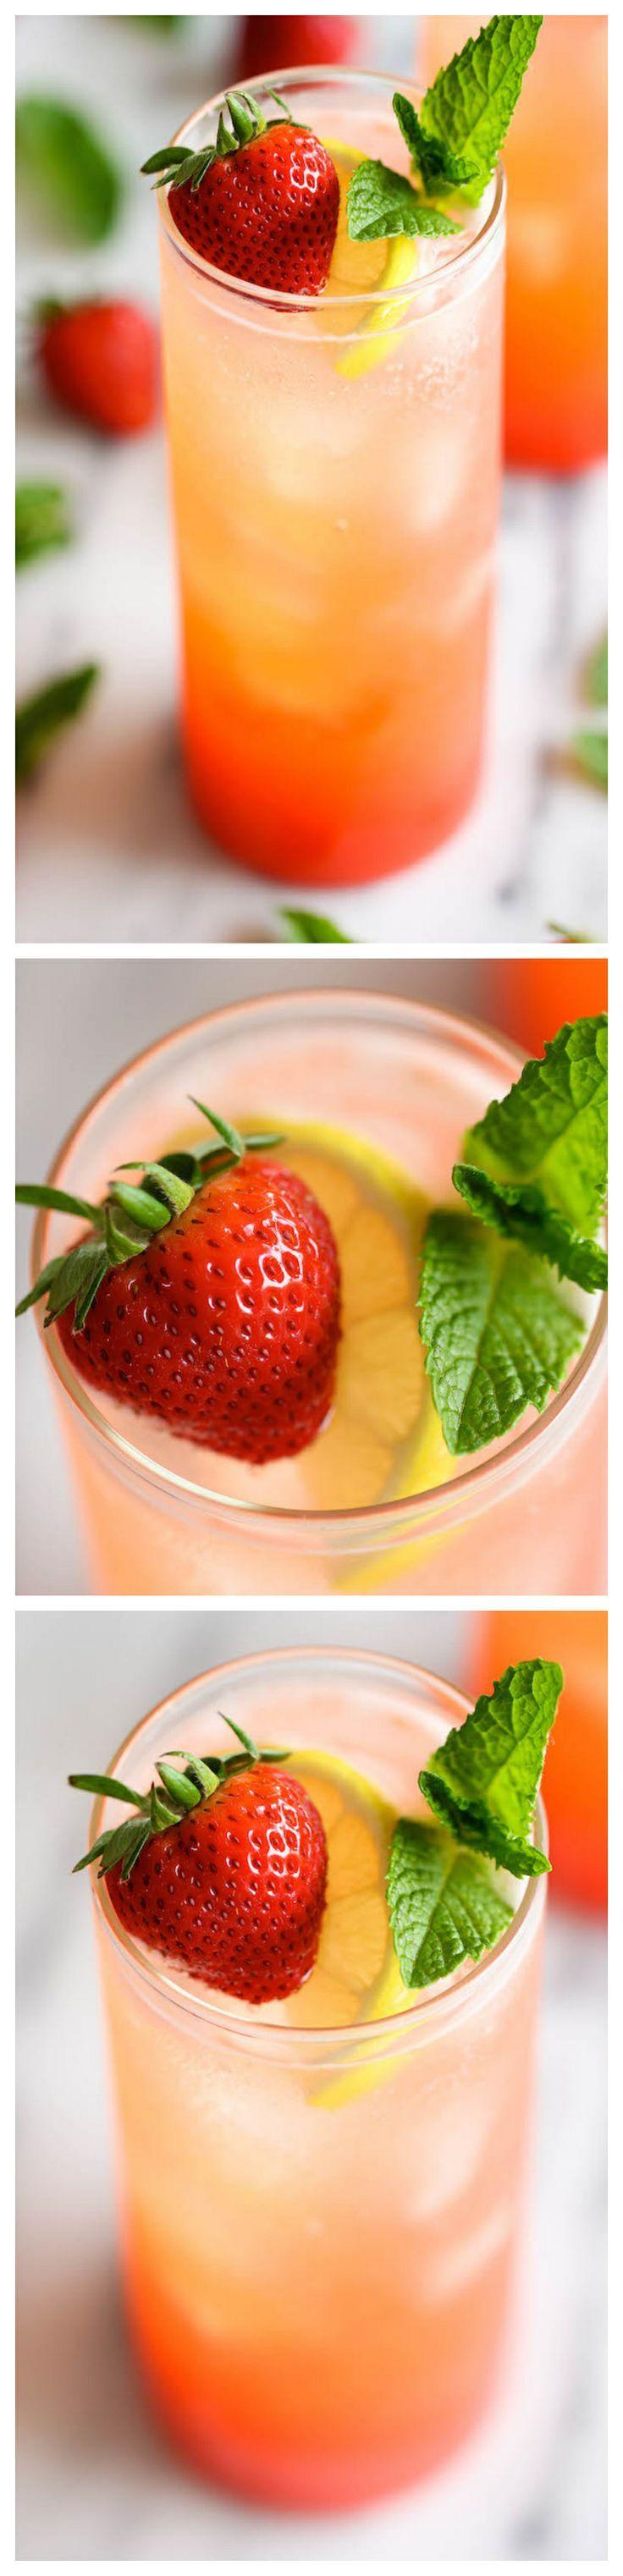 Sparkling Strawberry Lemonade - Damn Delicious